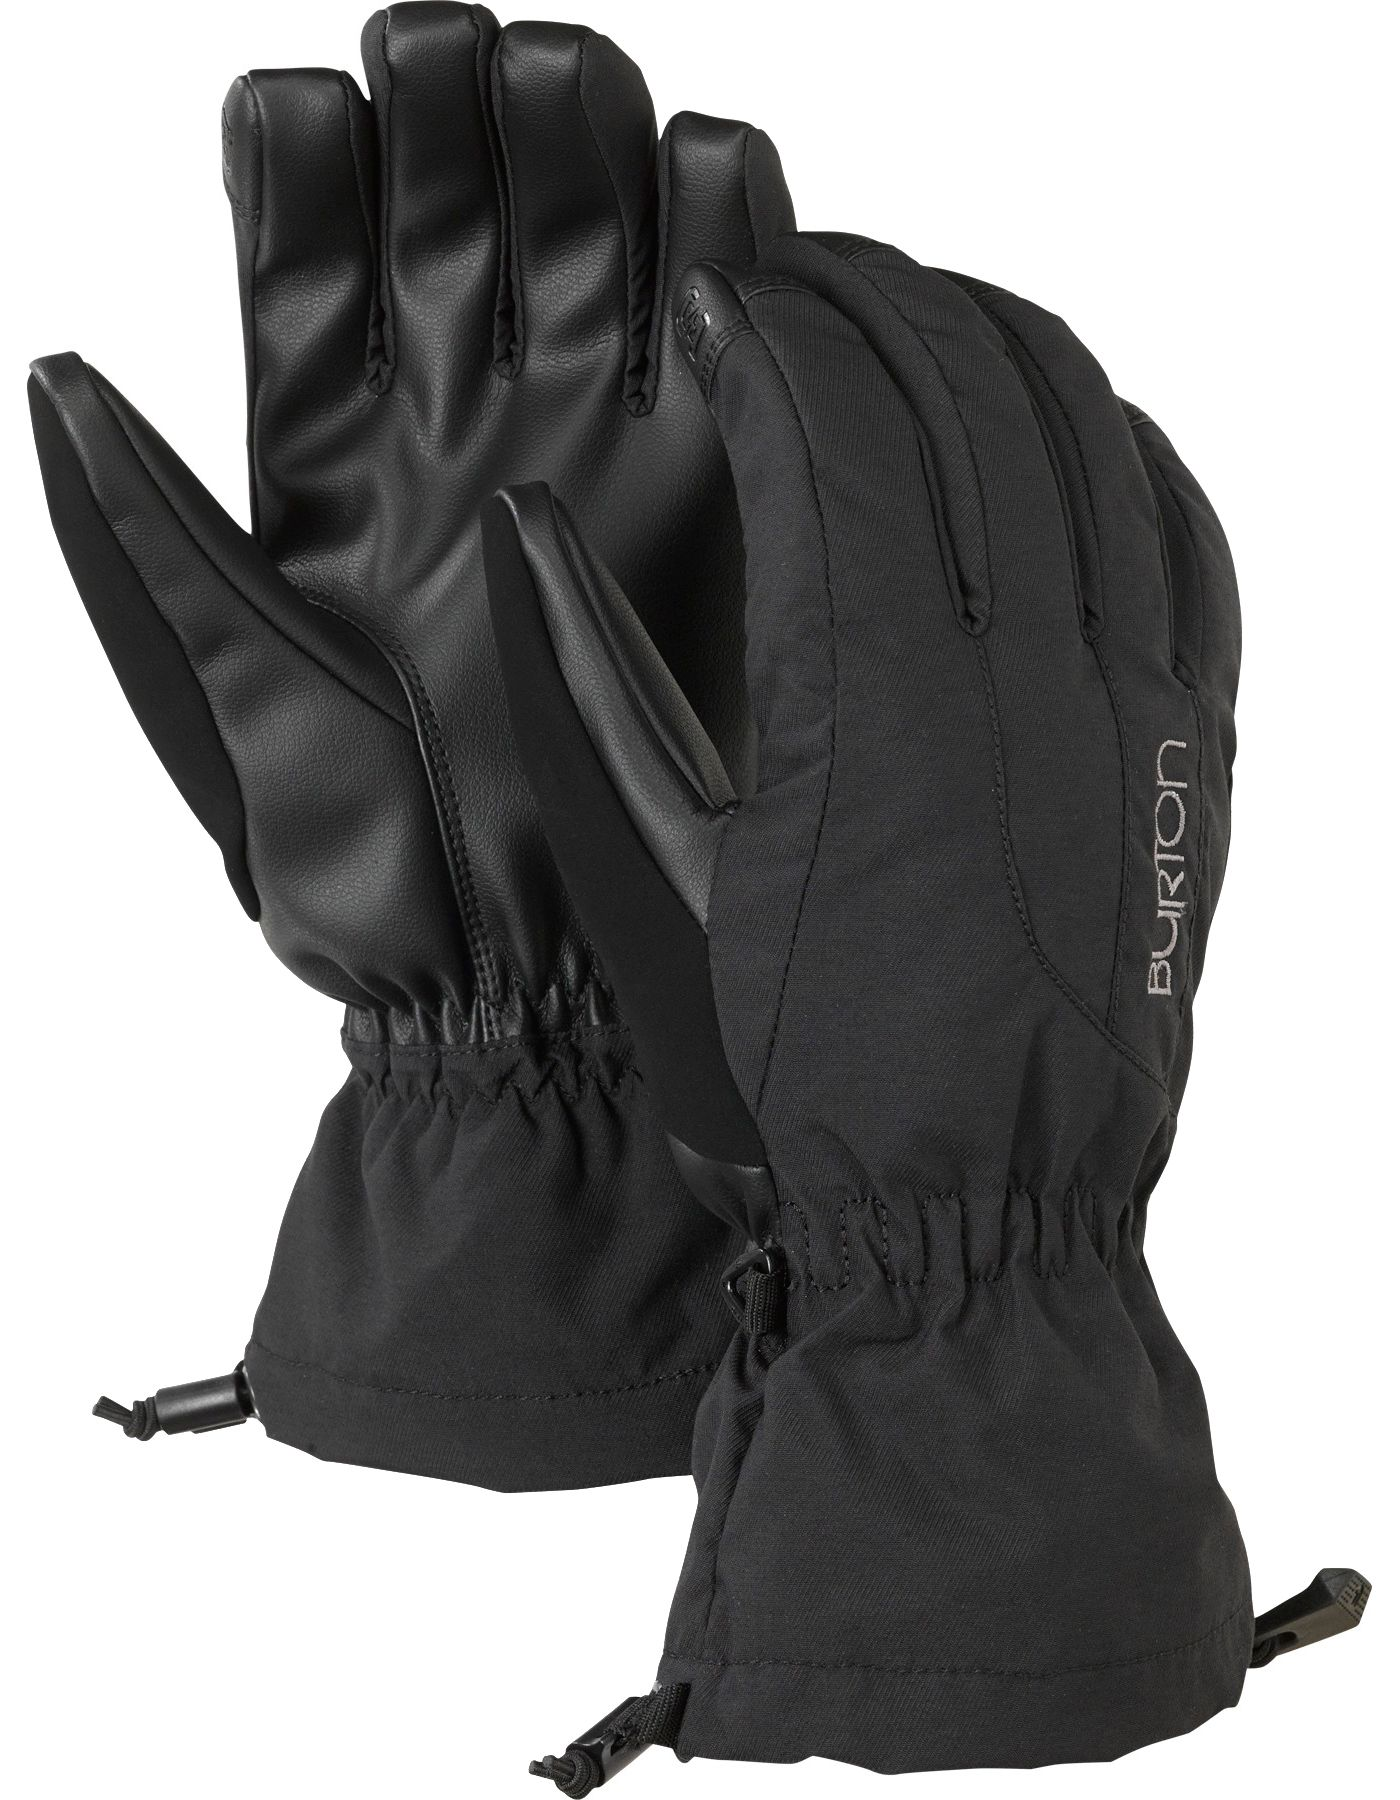 Burton Women's Profile Gloves 2013-2014